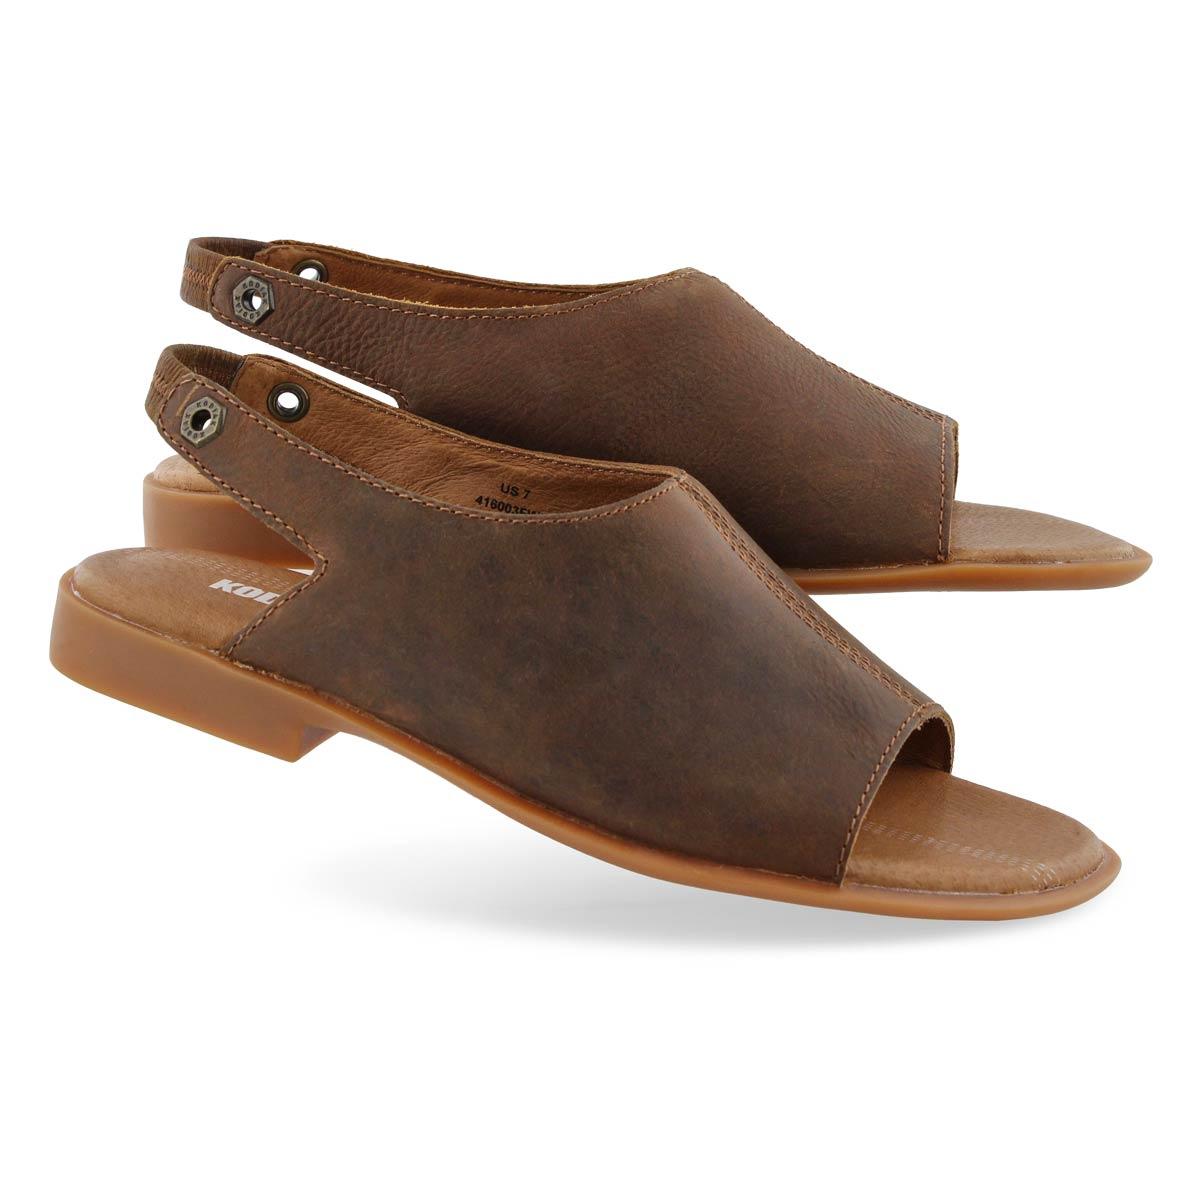 Lds Makenna wheat casual sandal